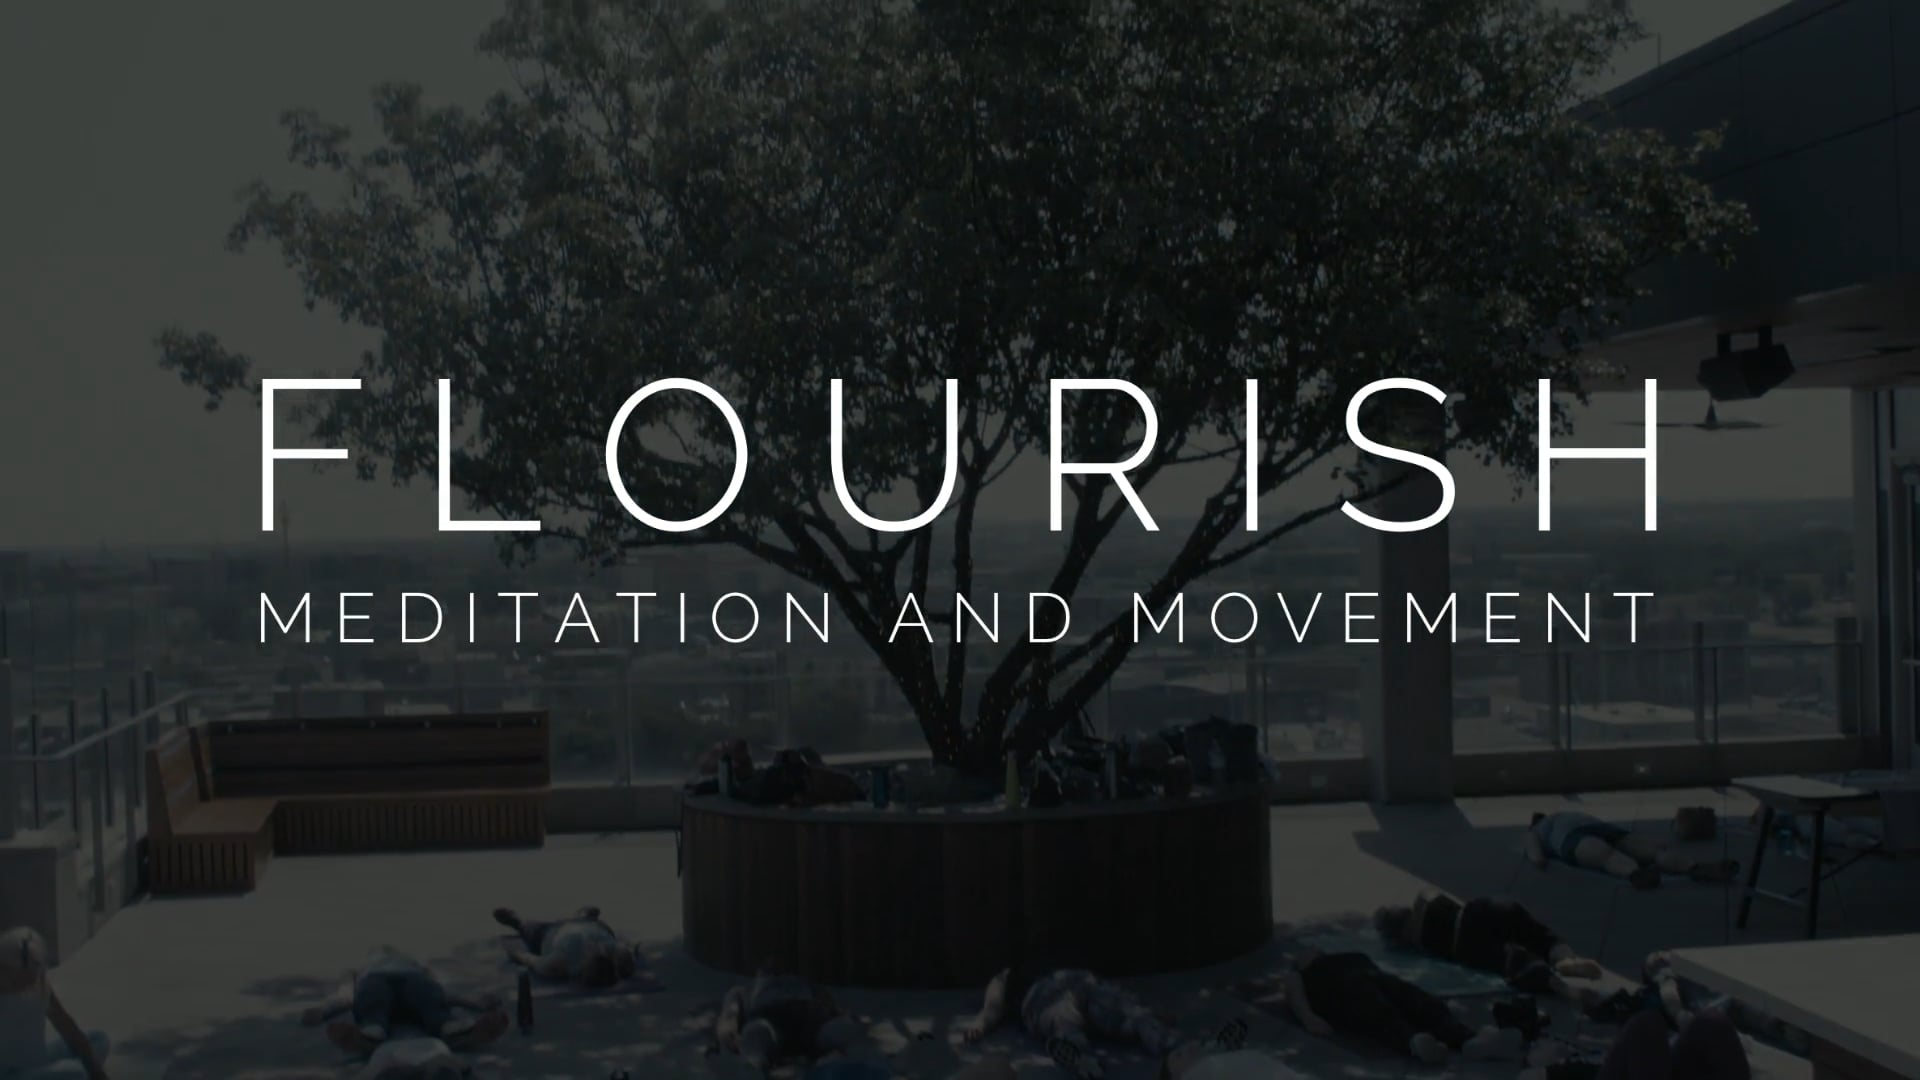 Flourish Meditation and Movement